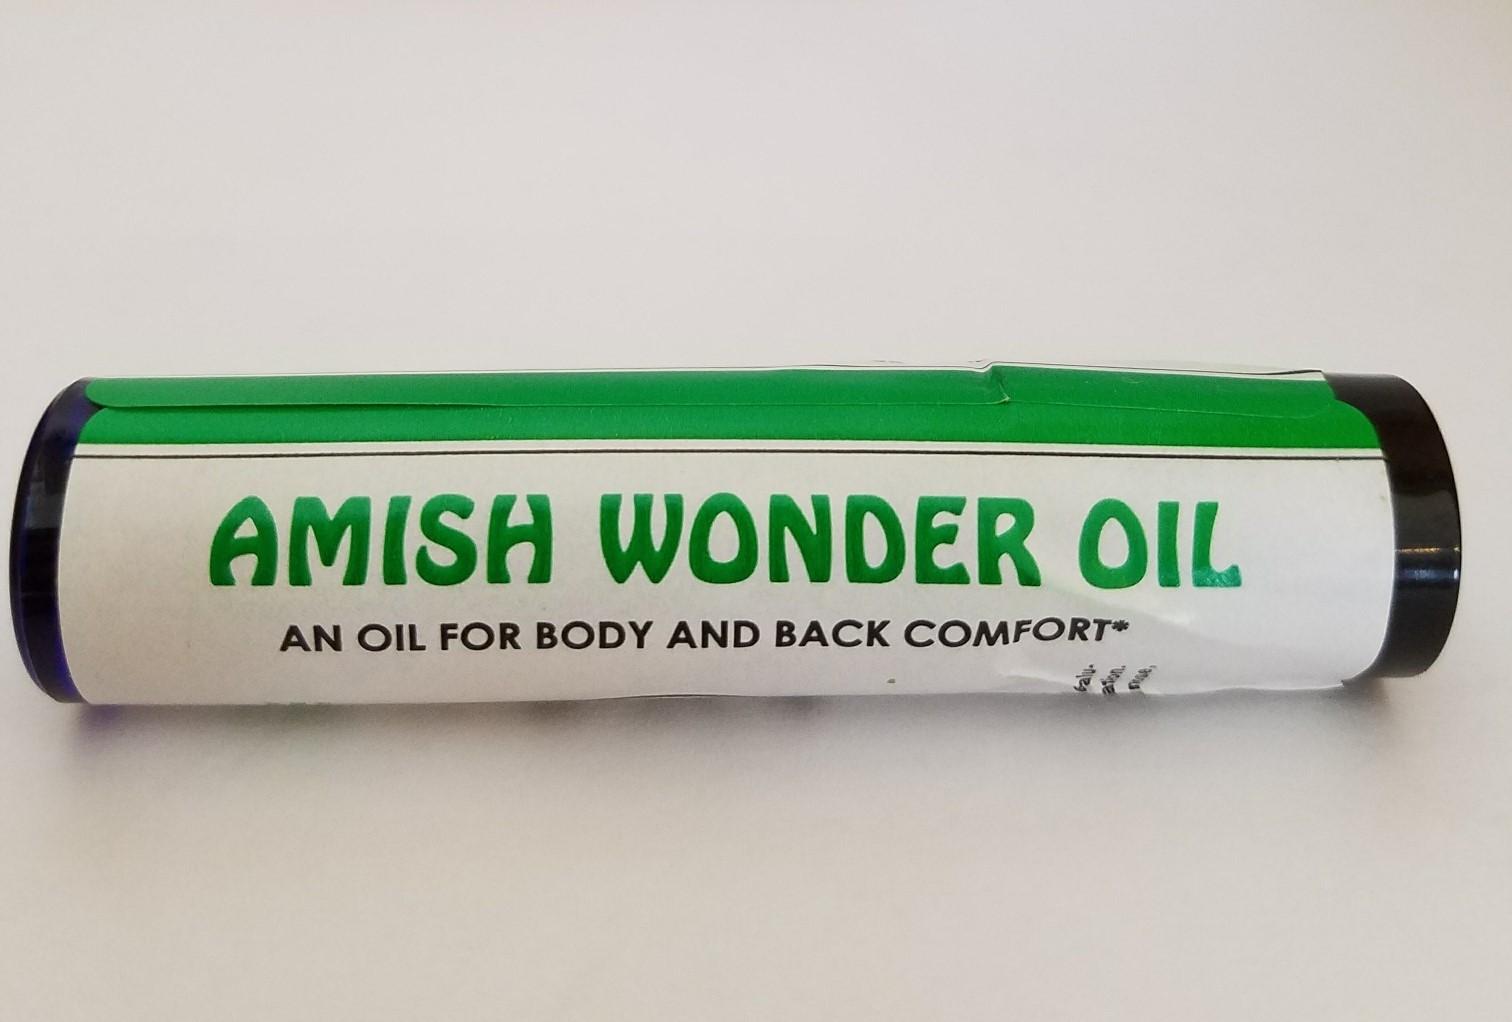 Amish Wonder Oil To Go